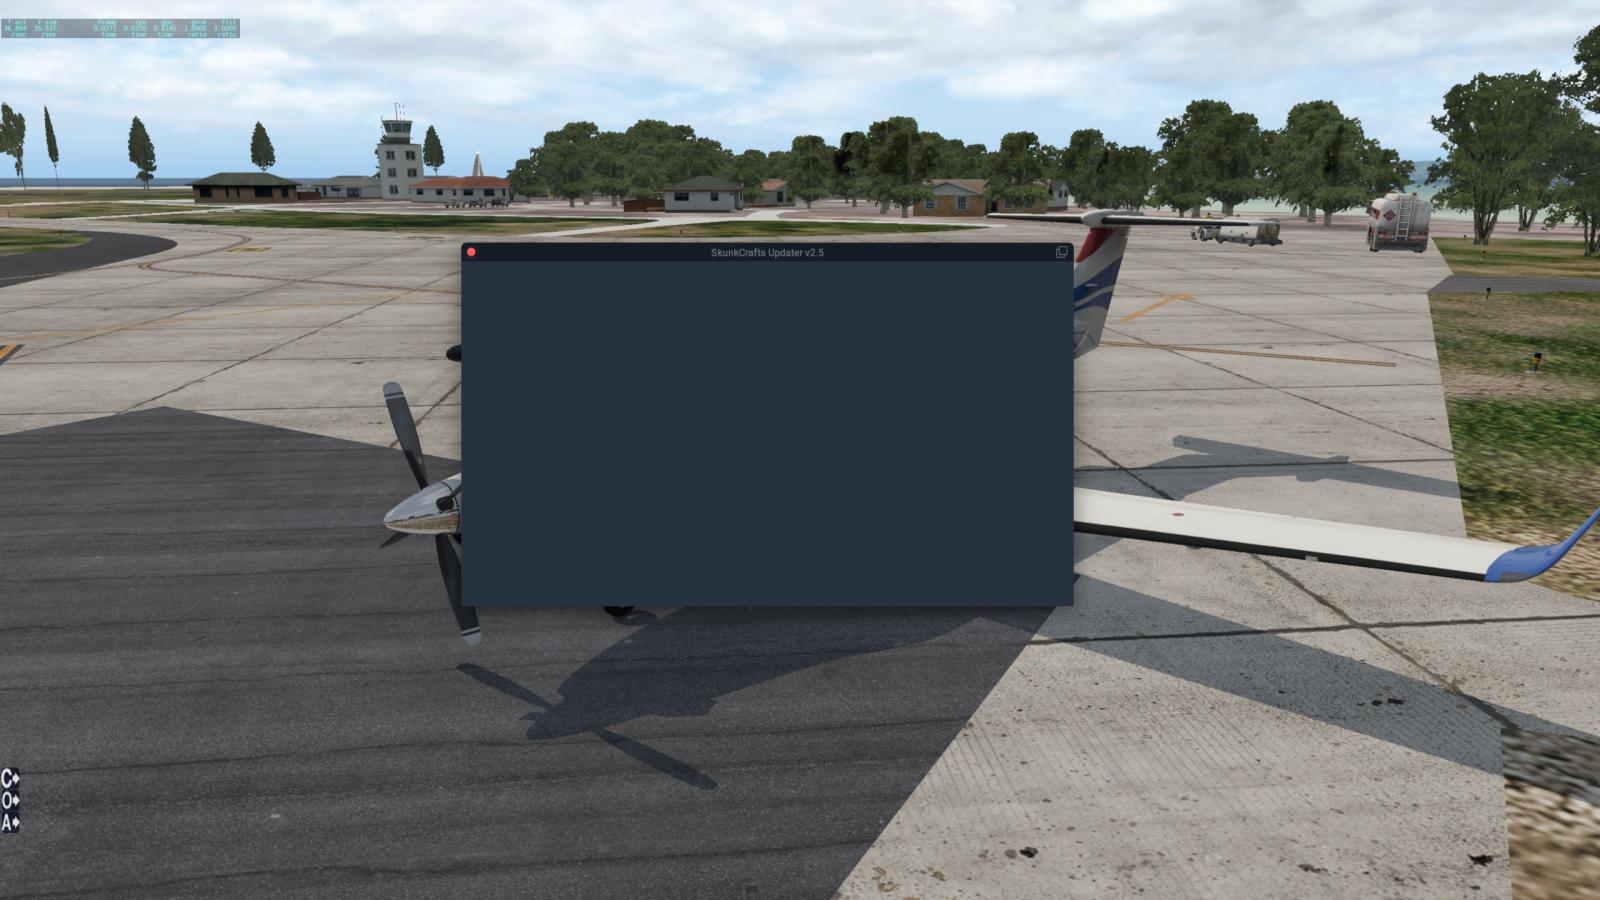 Updater Screen Blank - SkunkCrafts Updater - X-Plane Org Forum